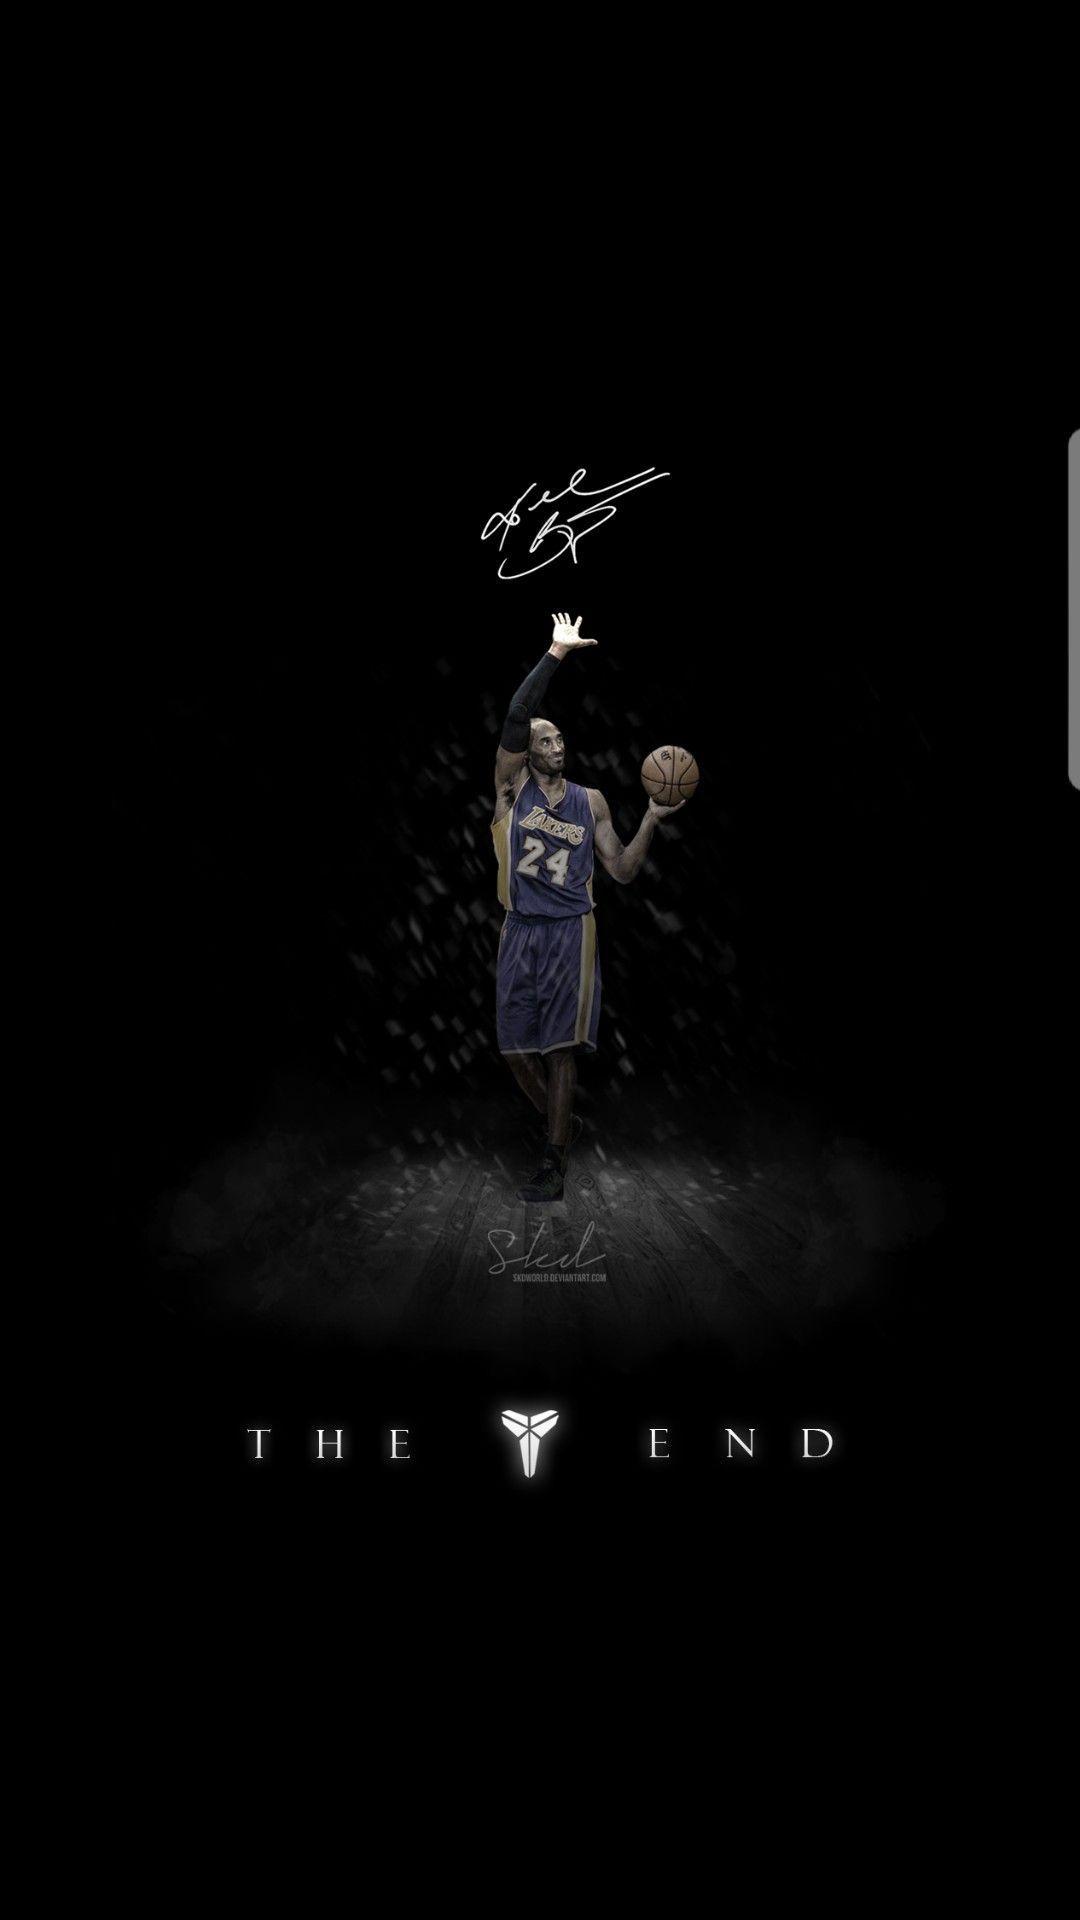 Lakers Lakeshow Nba Kobebryant Kobe Lebron Lebronjames Anthonydavis Mambame In 2020 Kobe Bryant Wallpaper Kobe Bryant Iphone Wallpaper Kobe Bryant Black Mamba